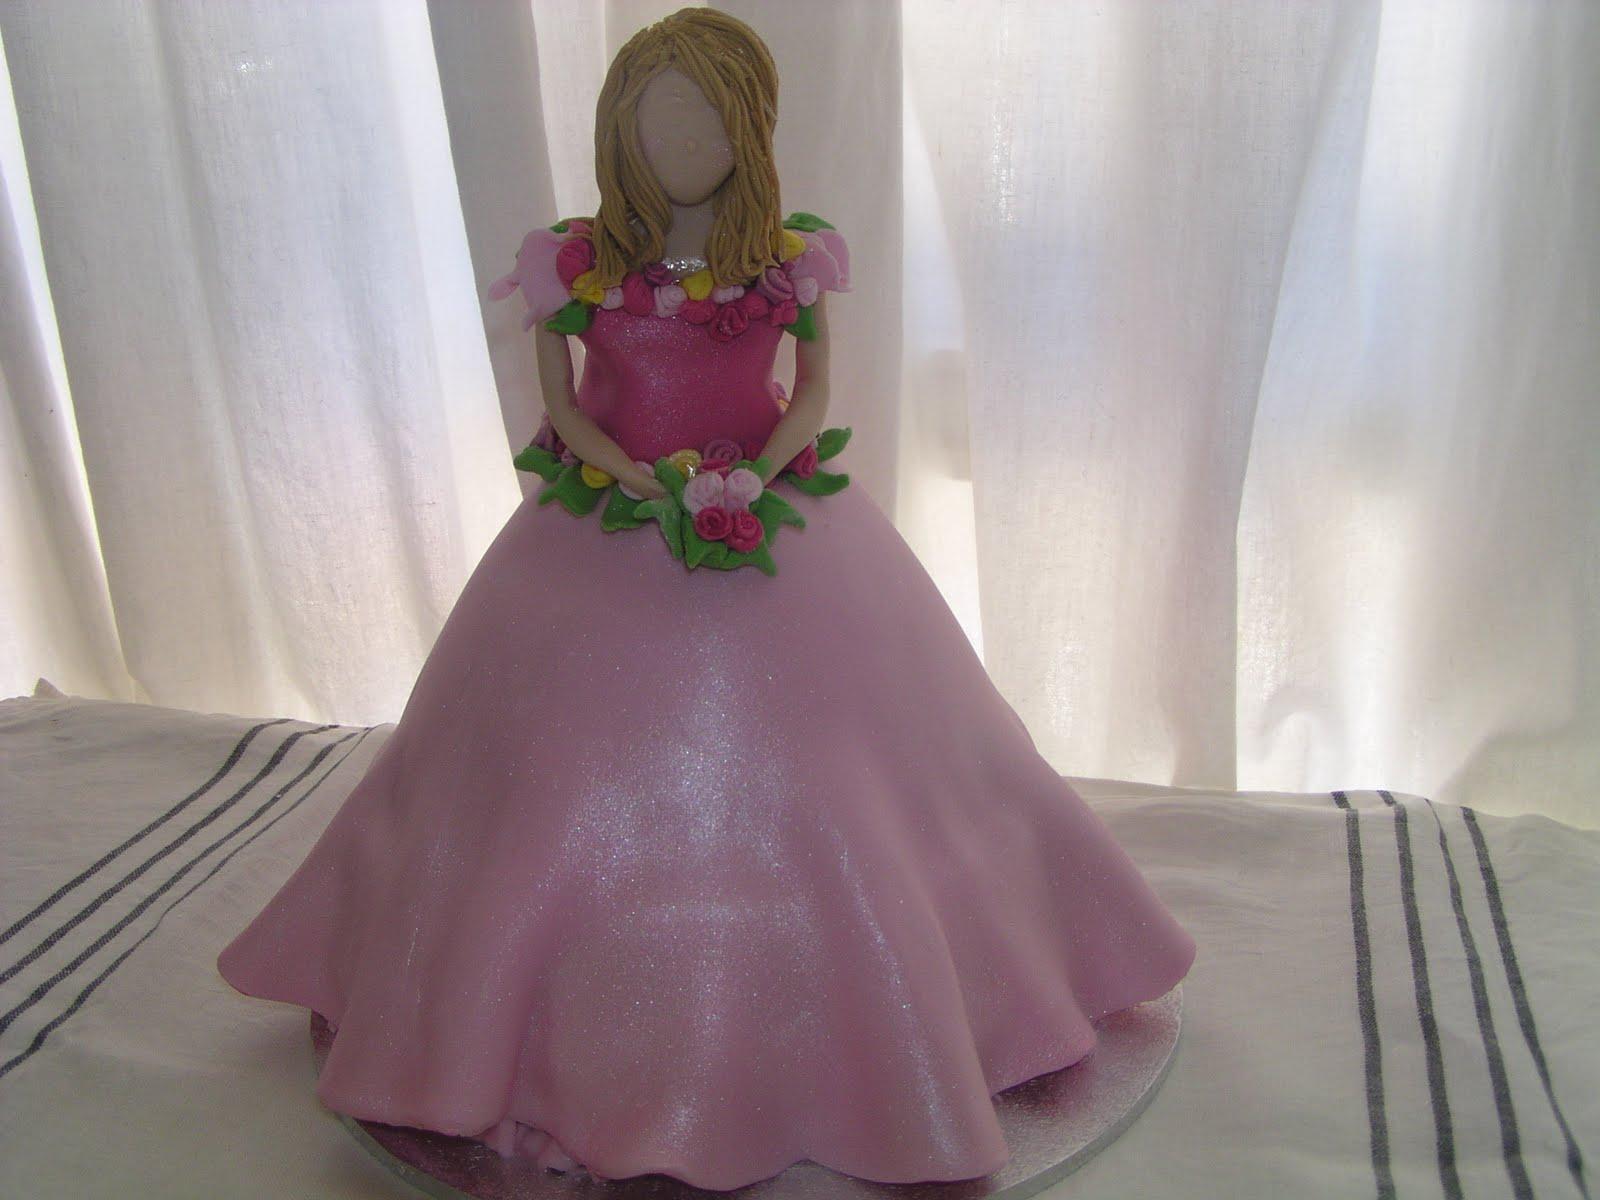 http://3.bp.blogspot.com/_MSMBCiTs9ns/S9UkWg5hKOI/AAAAAAAAAR0/DxB6qYO64PE/s1600/valentine+cup+cakes+023.jpg